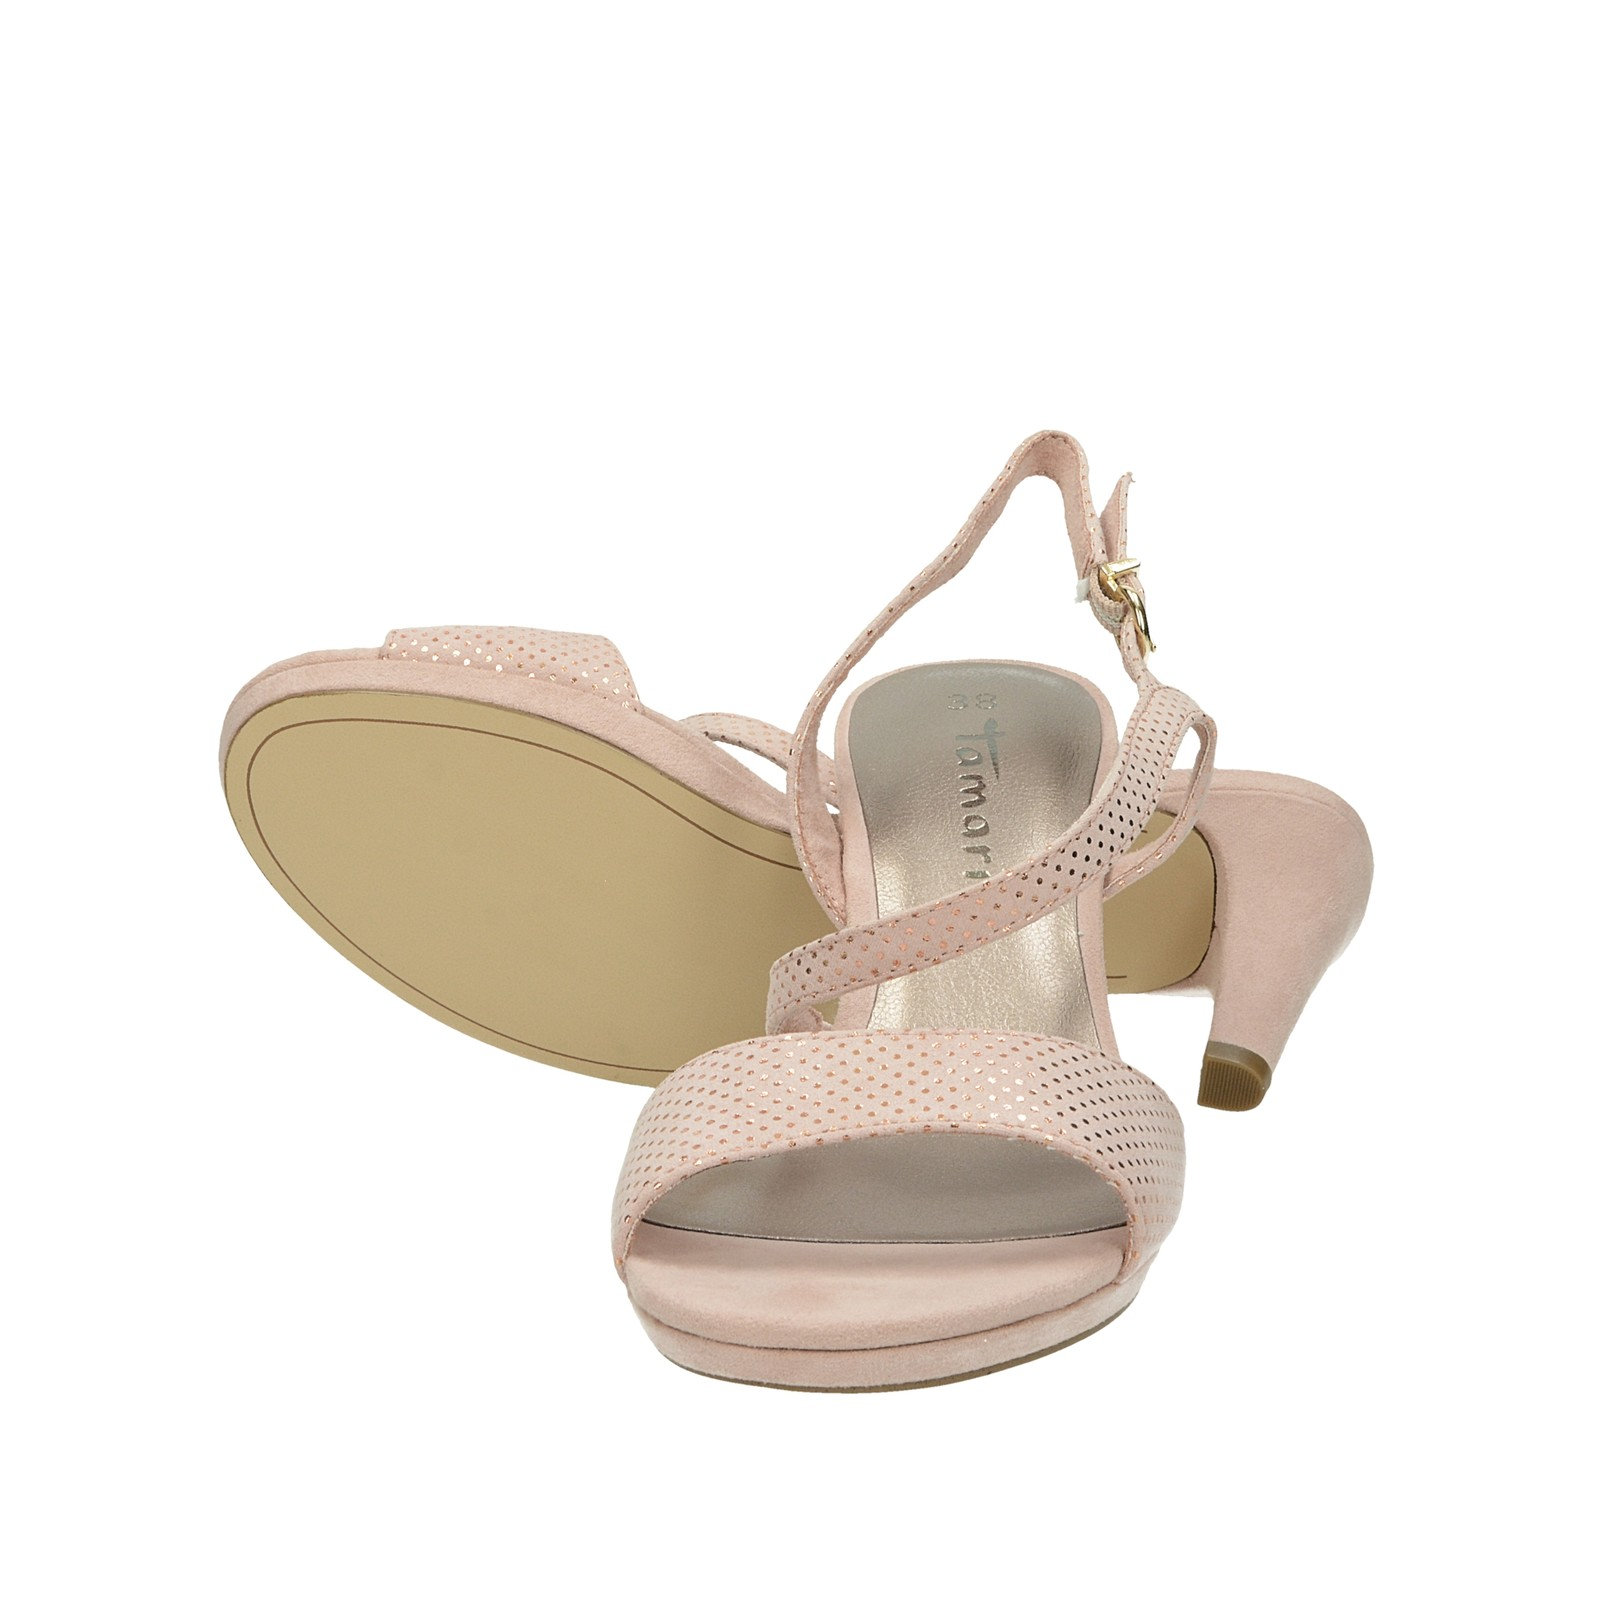 cb6c5f3fa Tamaris dámske sandále s remienkom - ružové   2831822-ROSEdots www ...